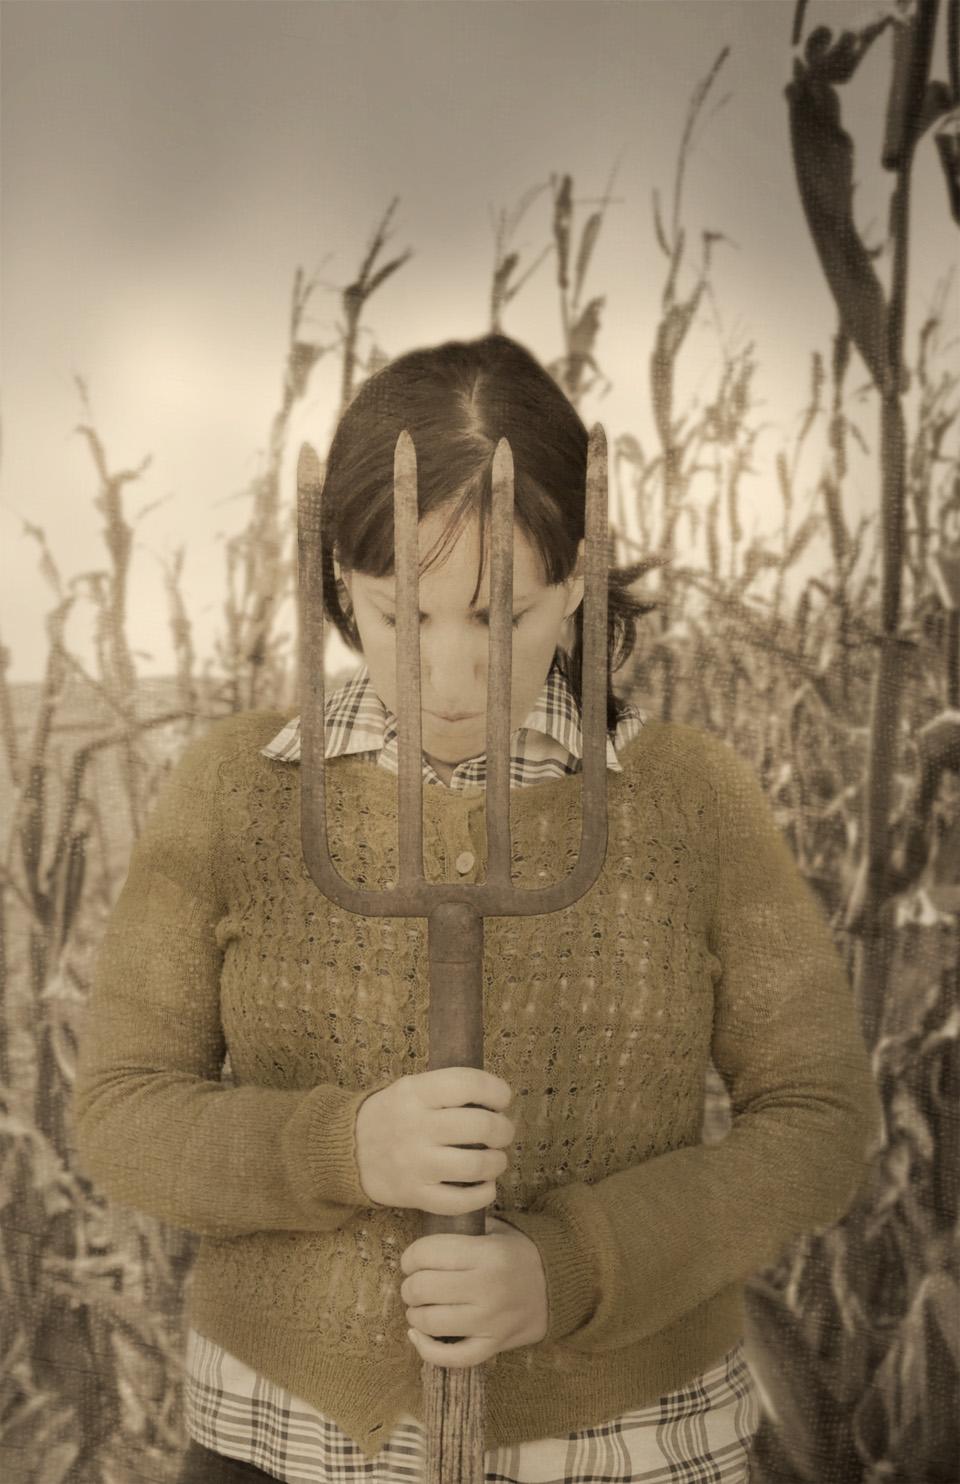 ninth shift: the harvest